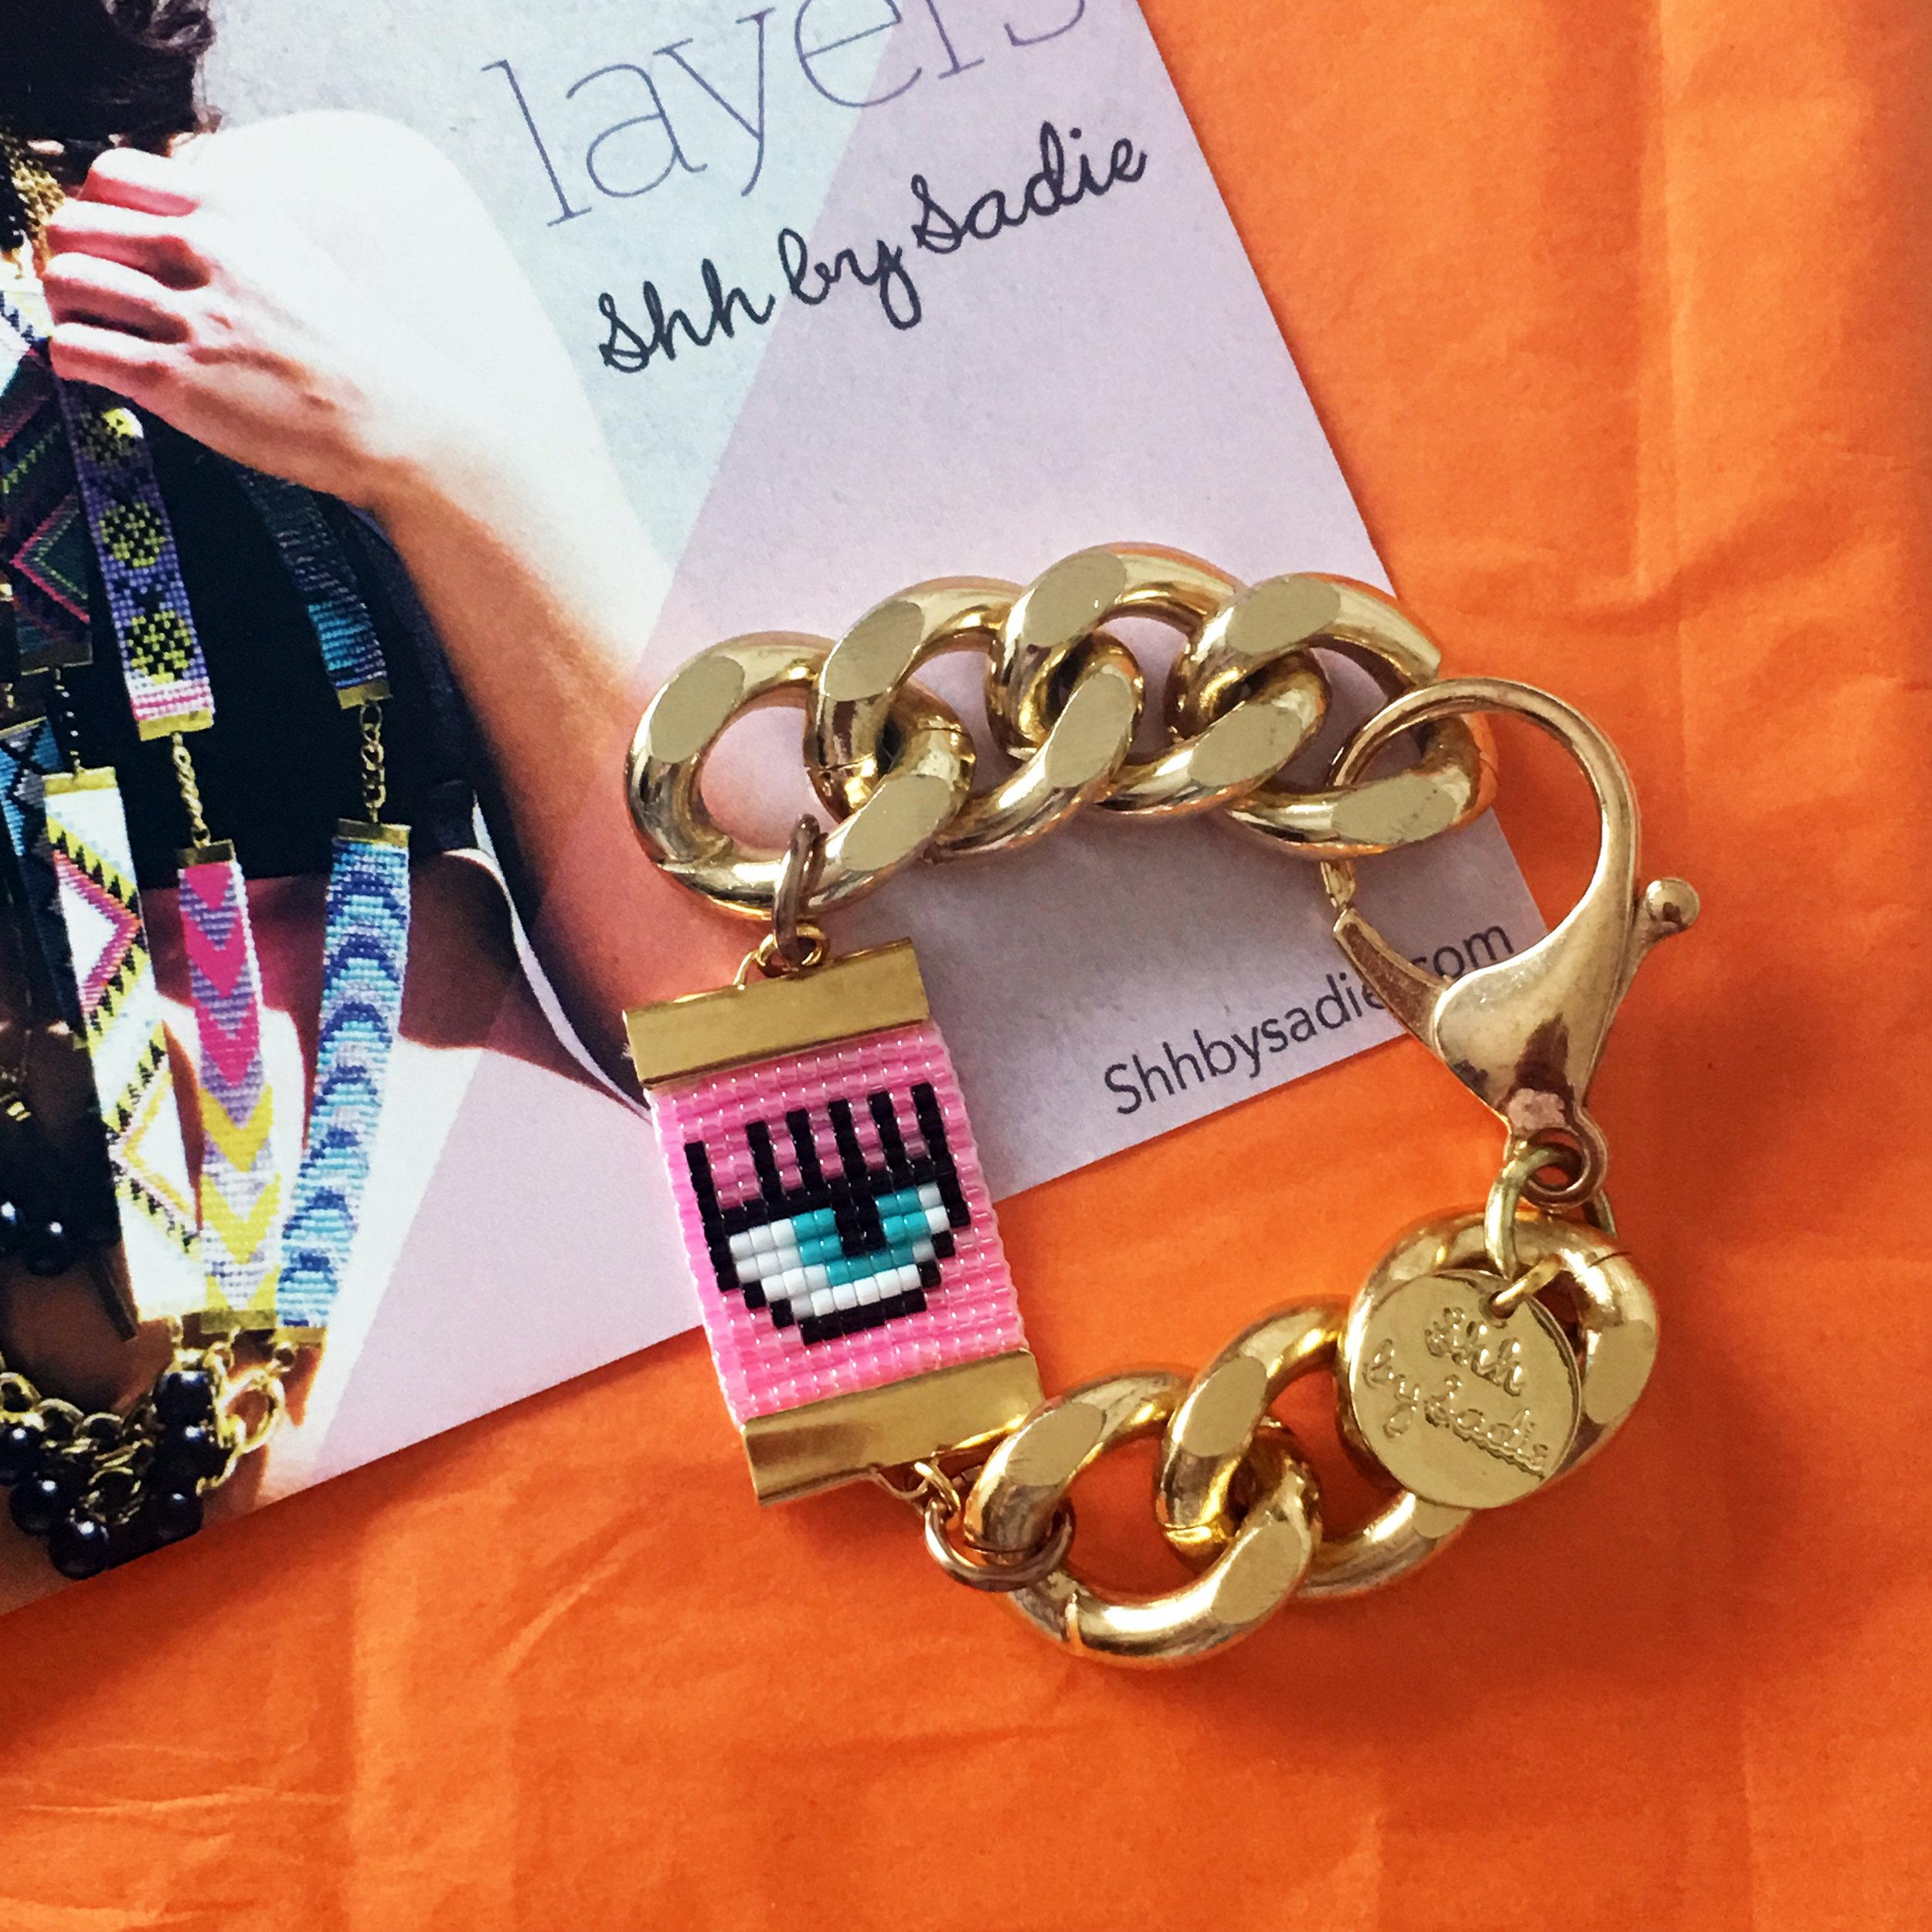 chiara ferrigni eye bracelet custom design by British jewellery designer shh by sadie